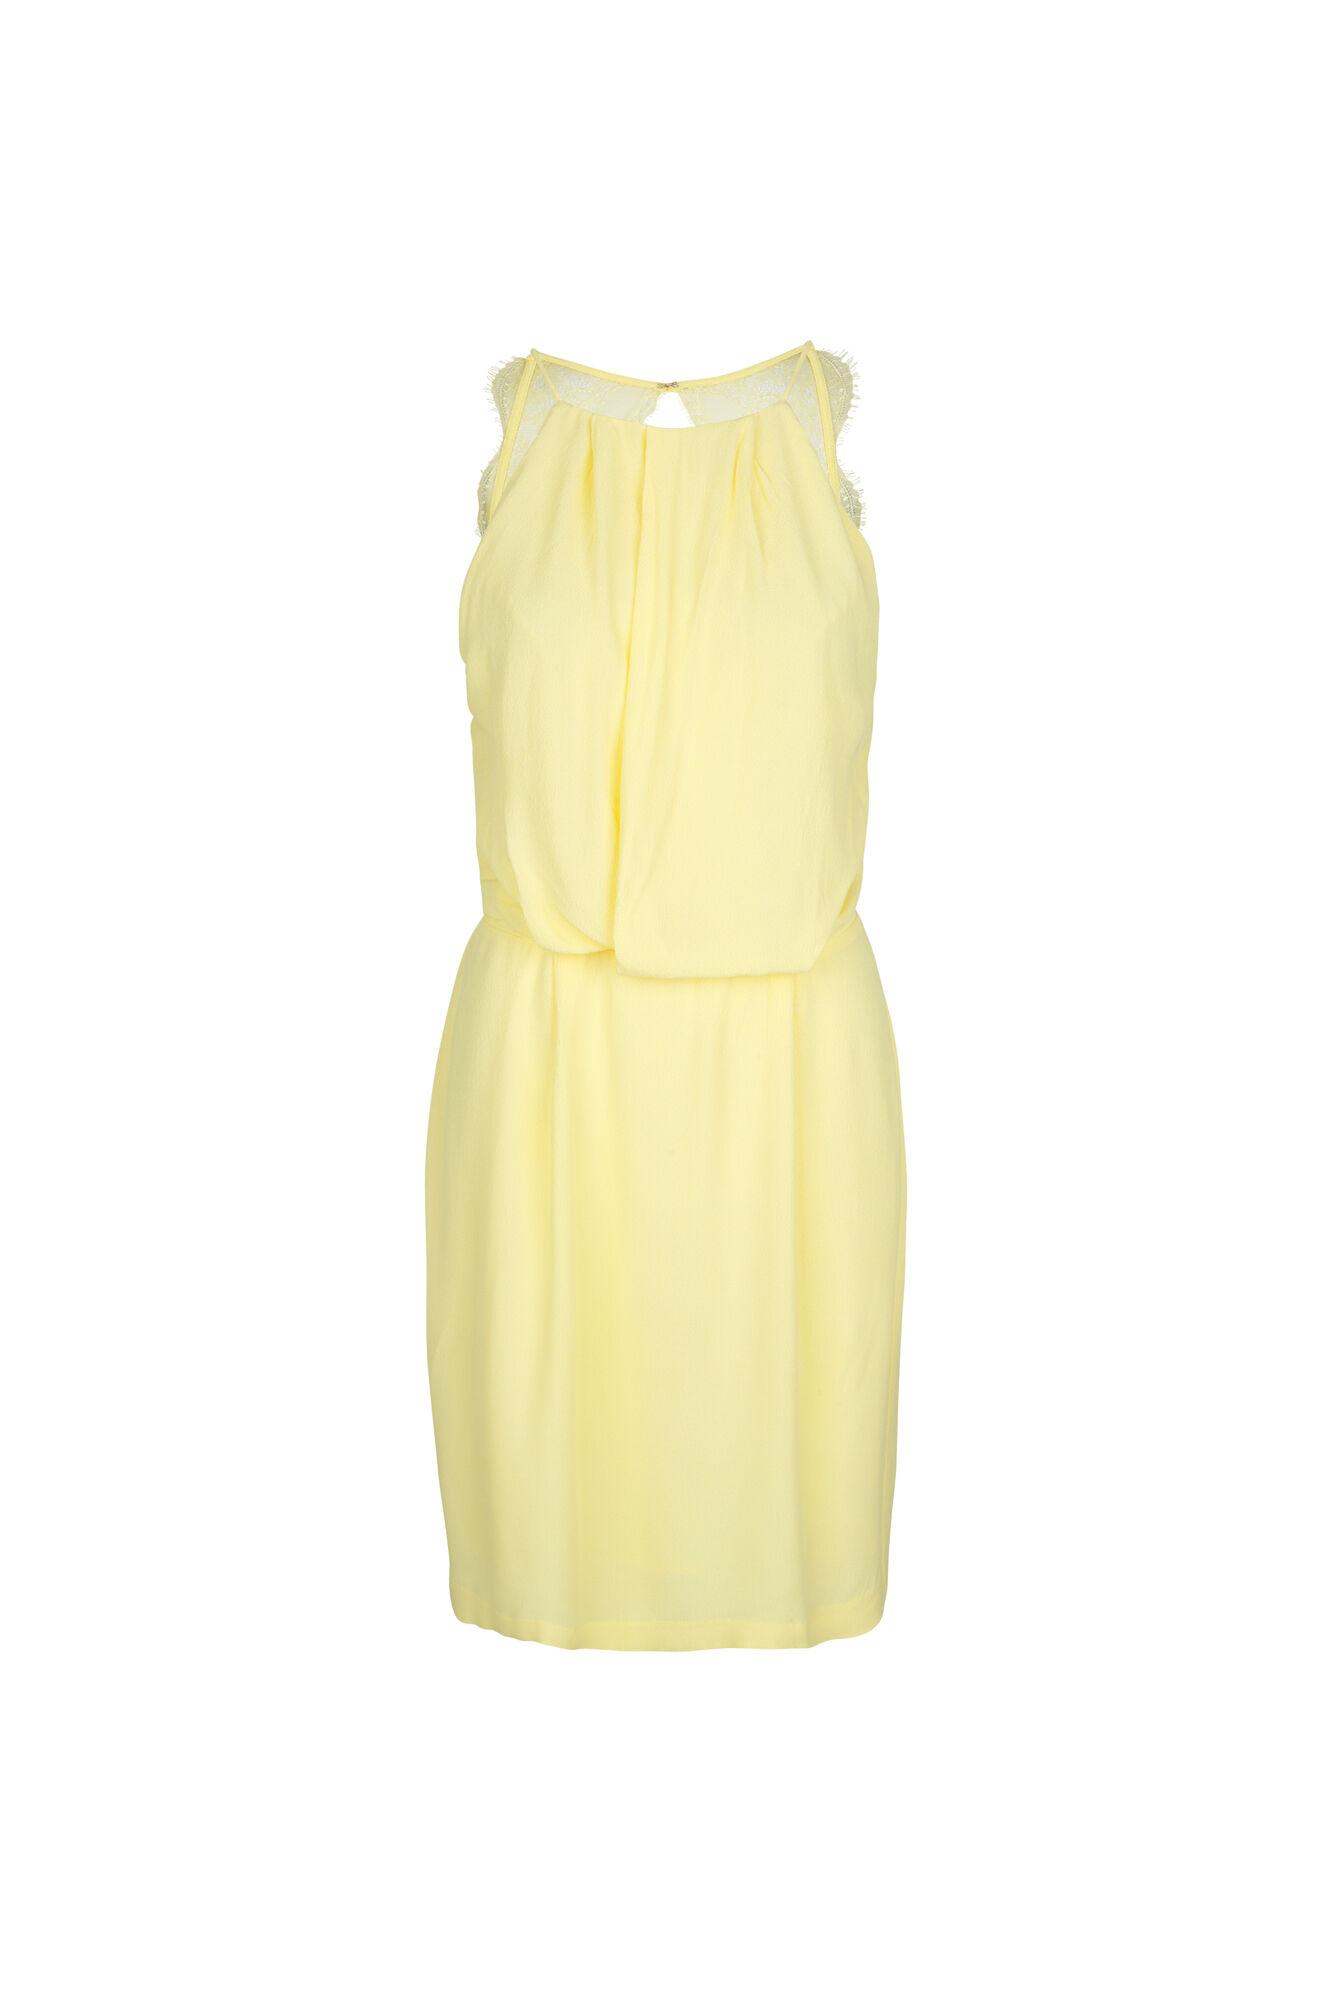 Willow short dress 5687, FRENCH VANILLA